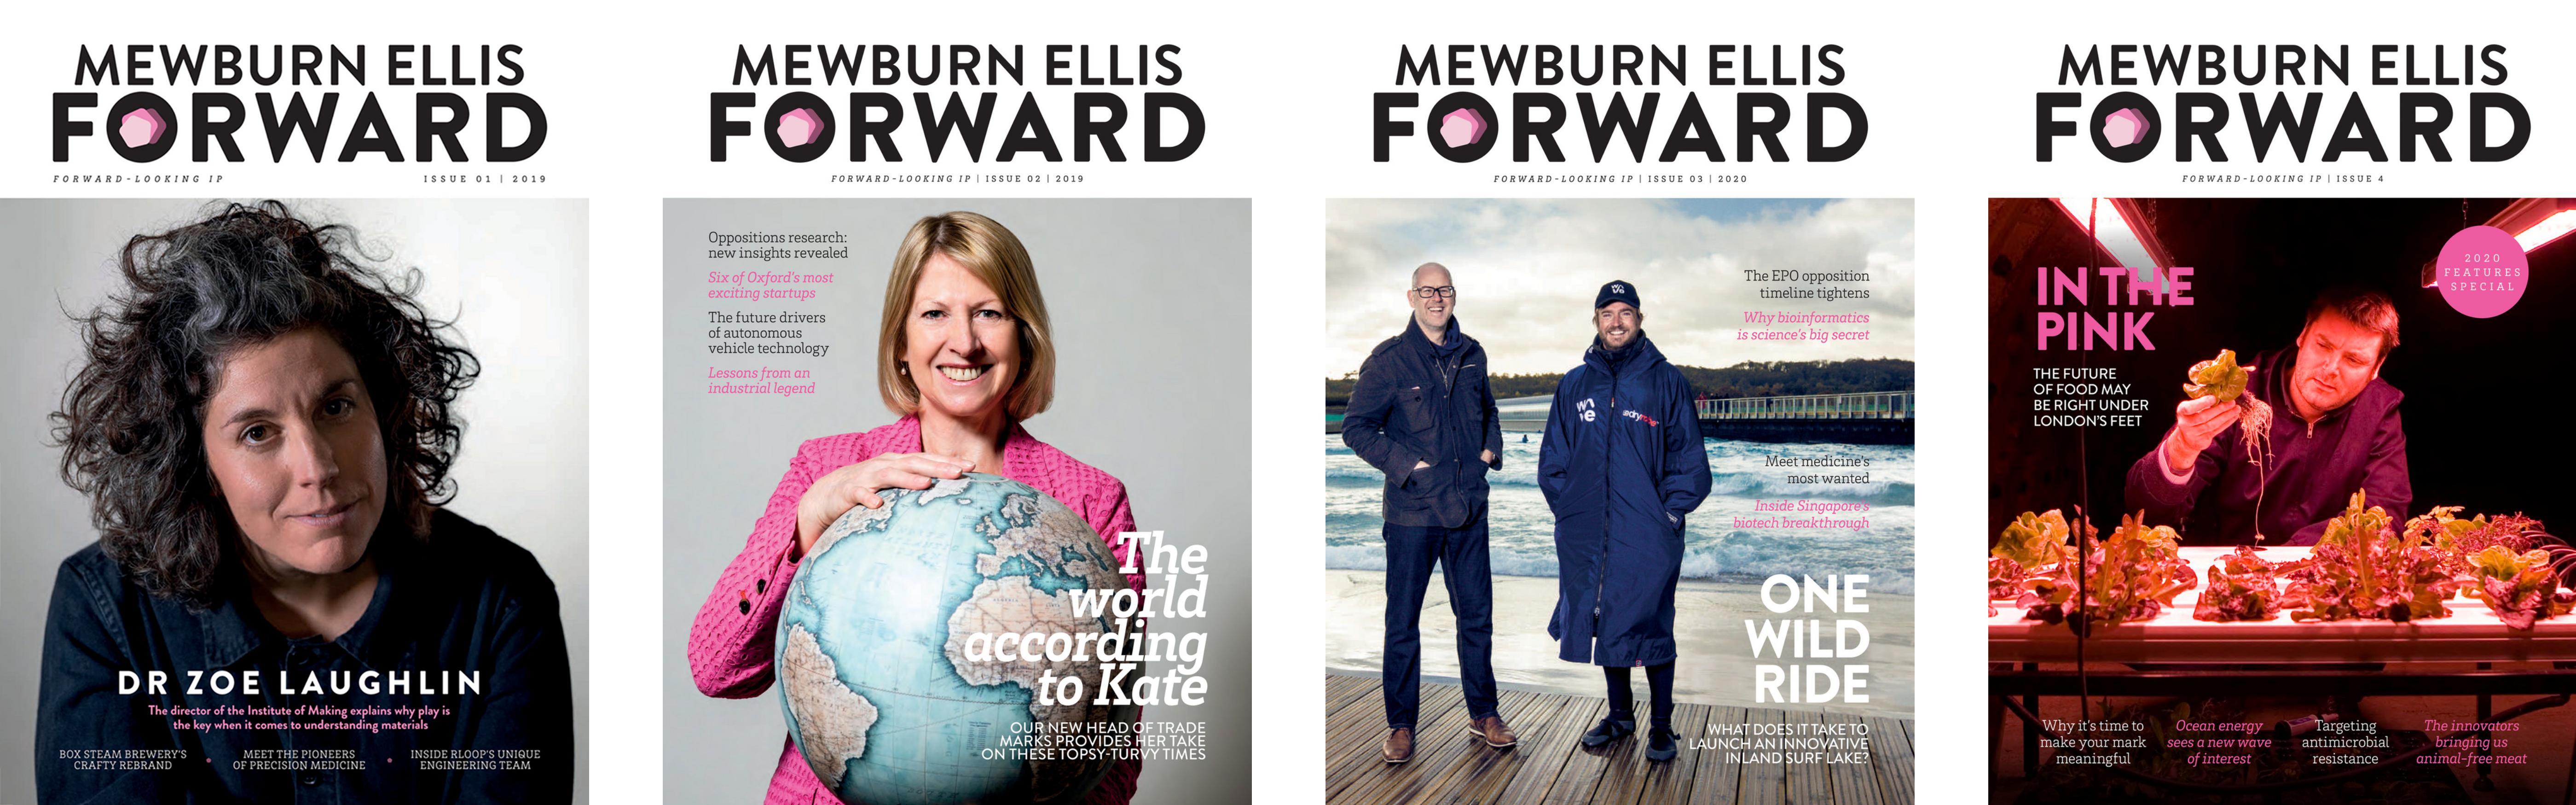 Forward Magazines 4